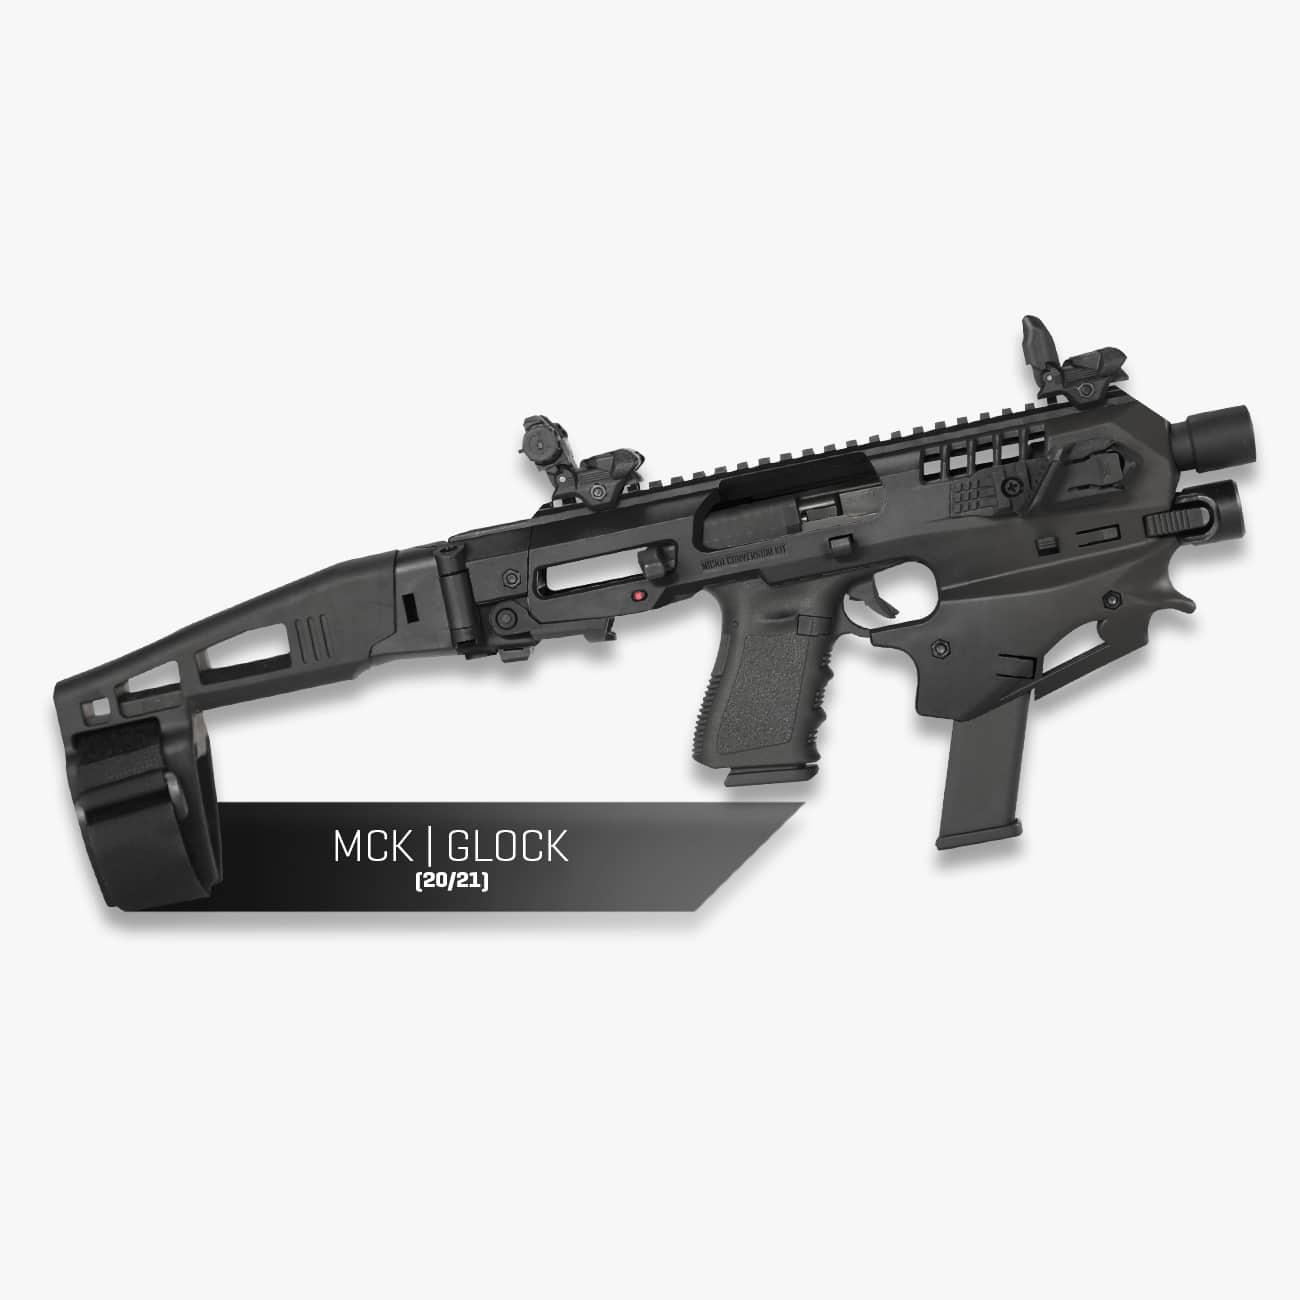 MCK | Micro Conversion Kit (Glock 20/21)